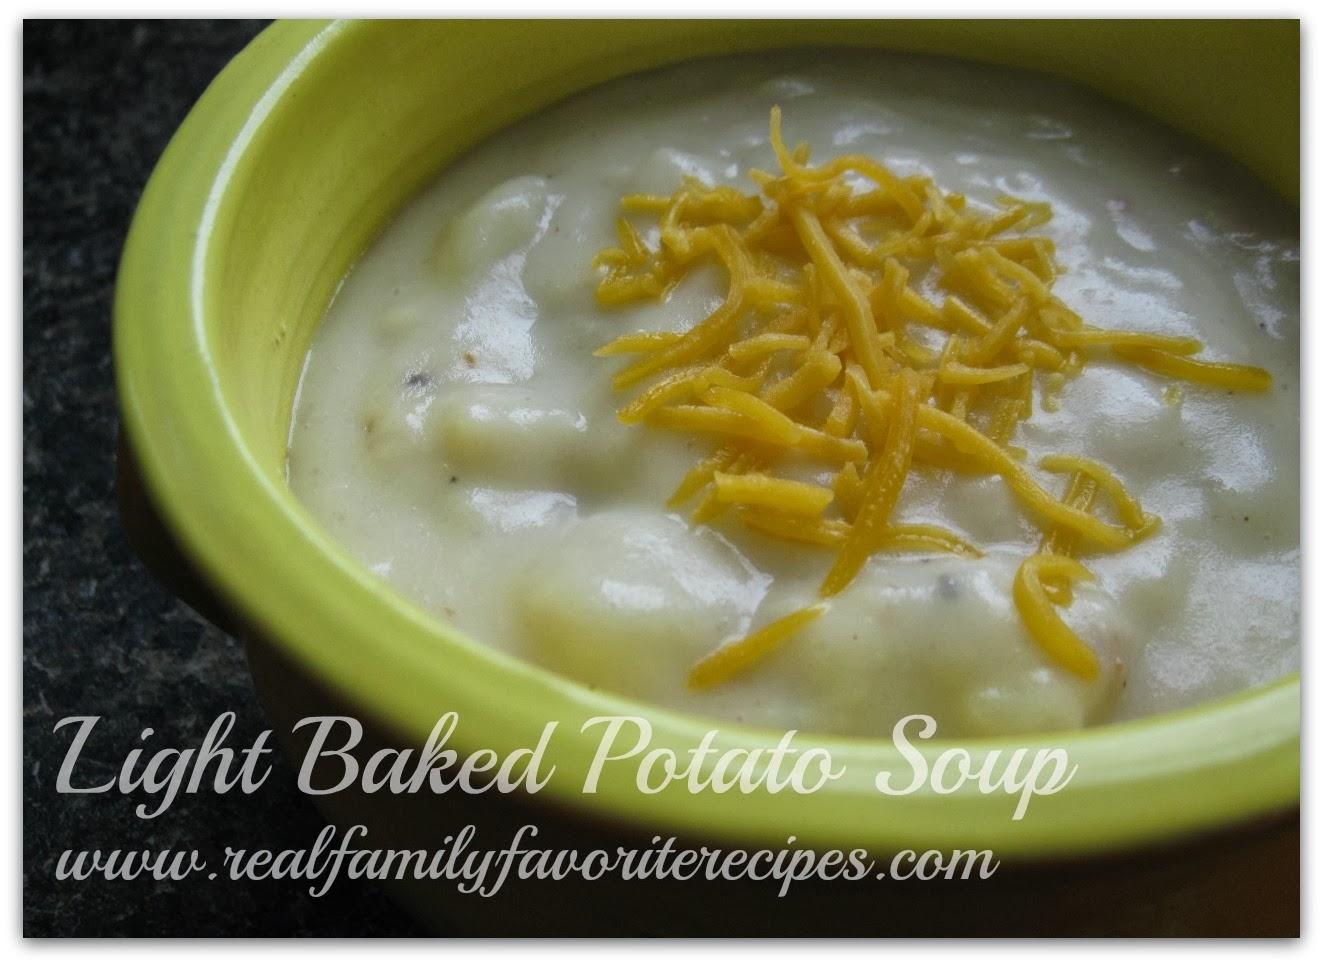 Family Favorite Recipes: Easy Light Baked Potato Soup